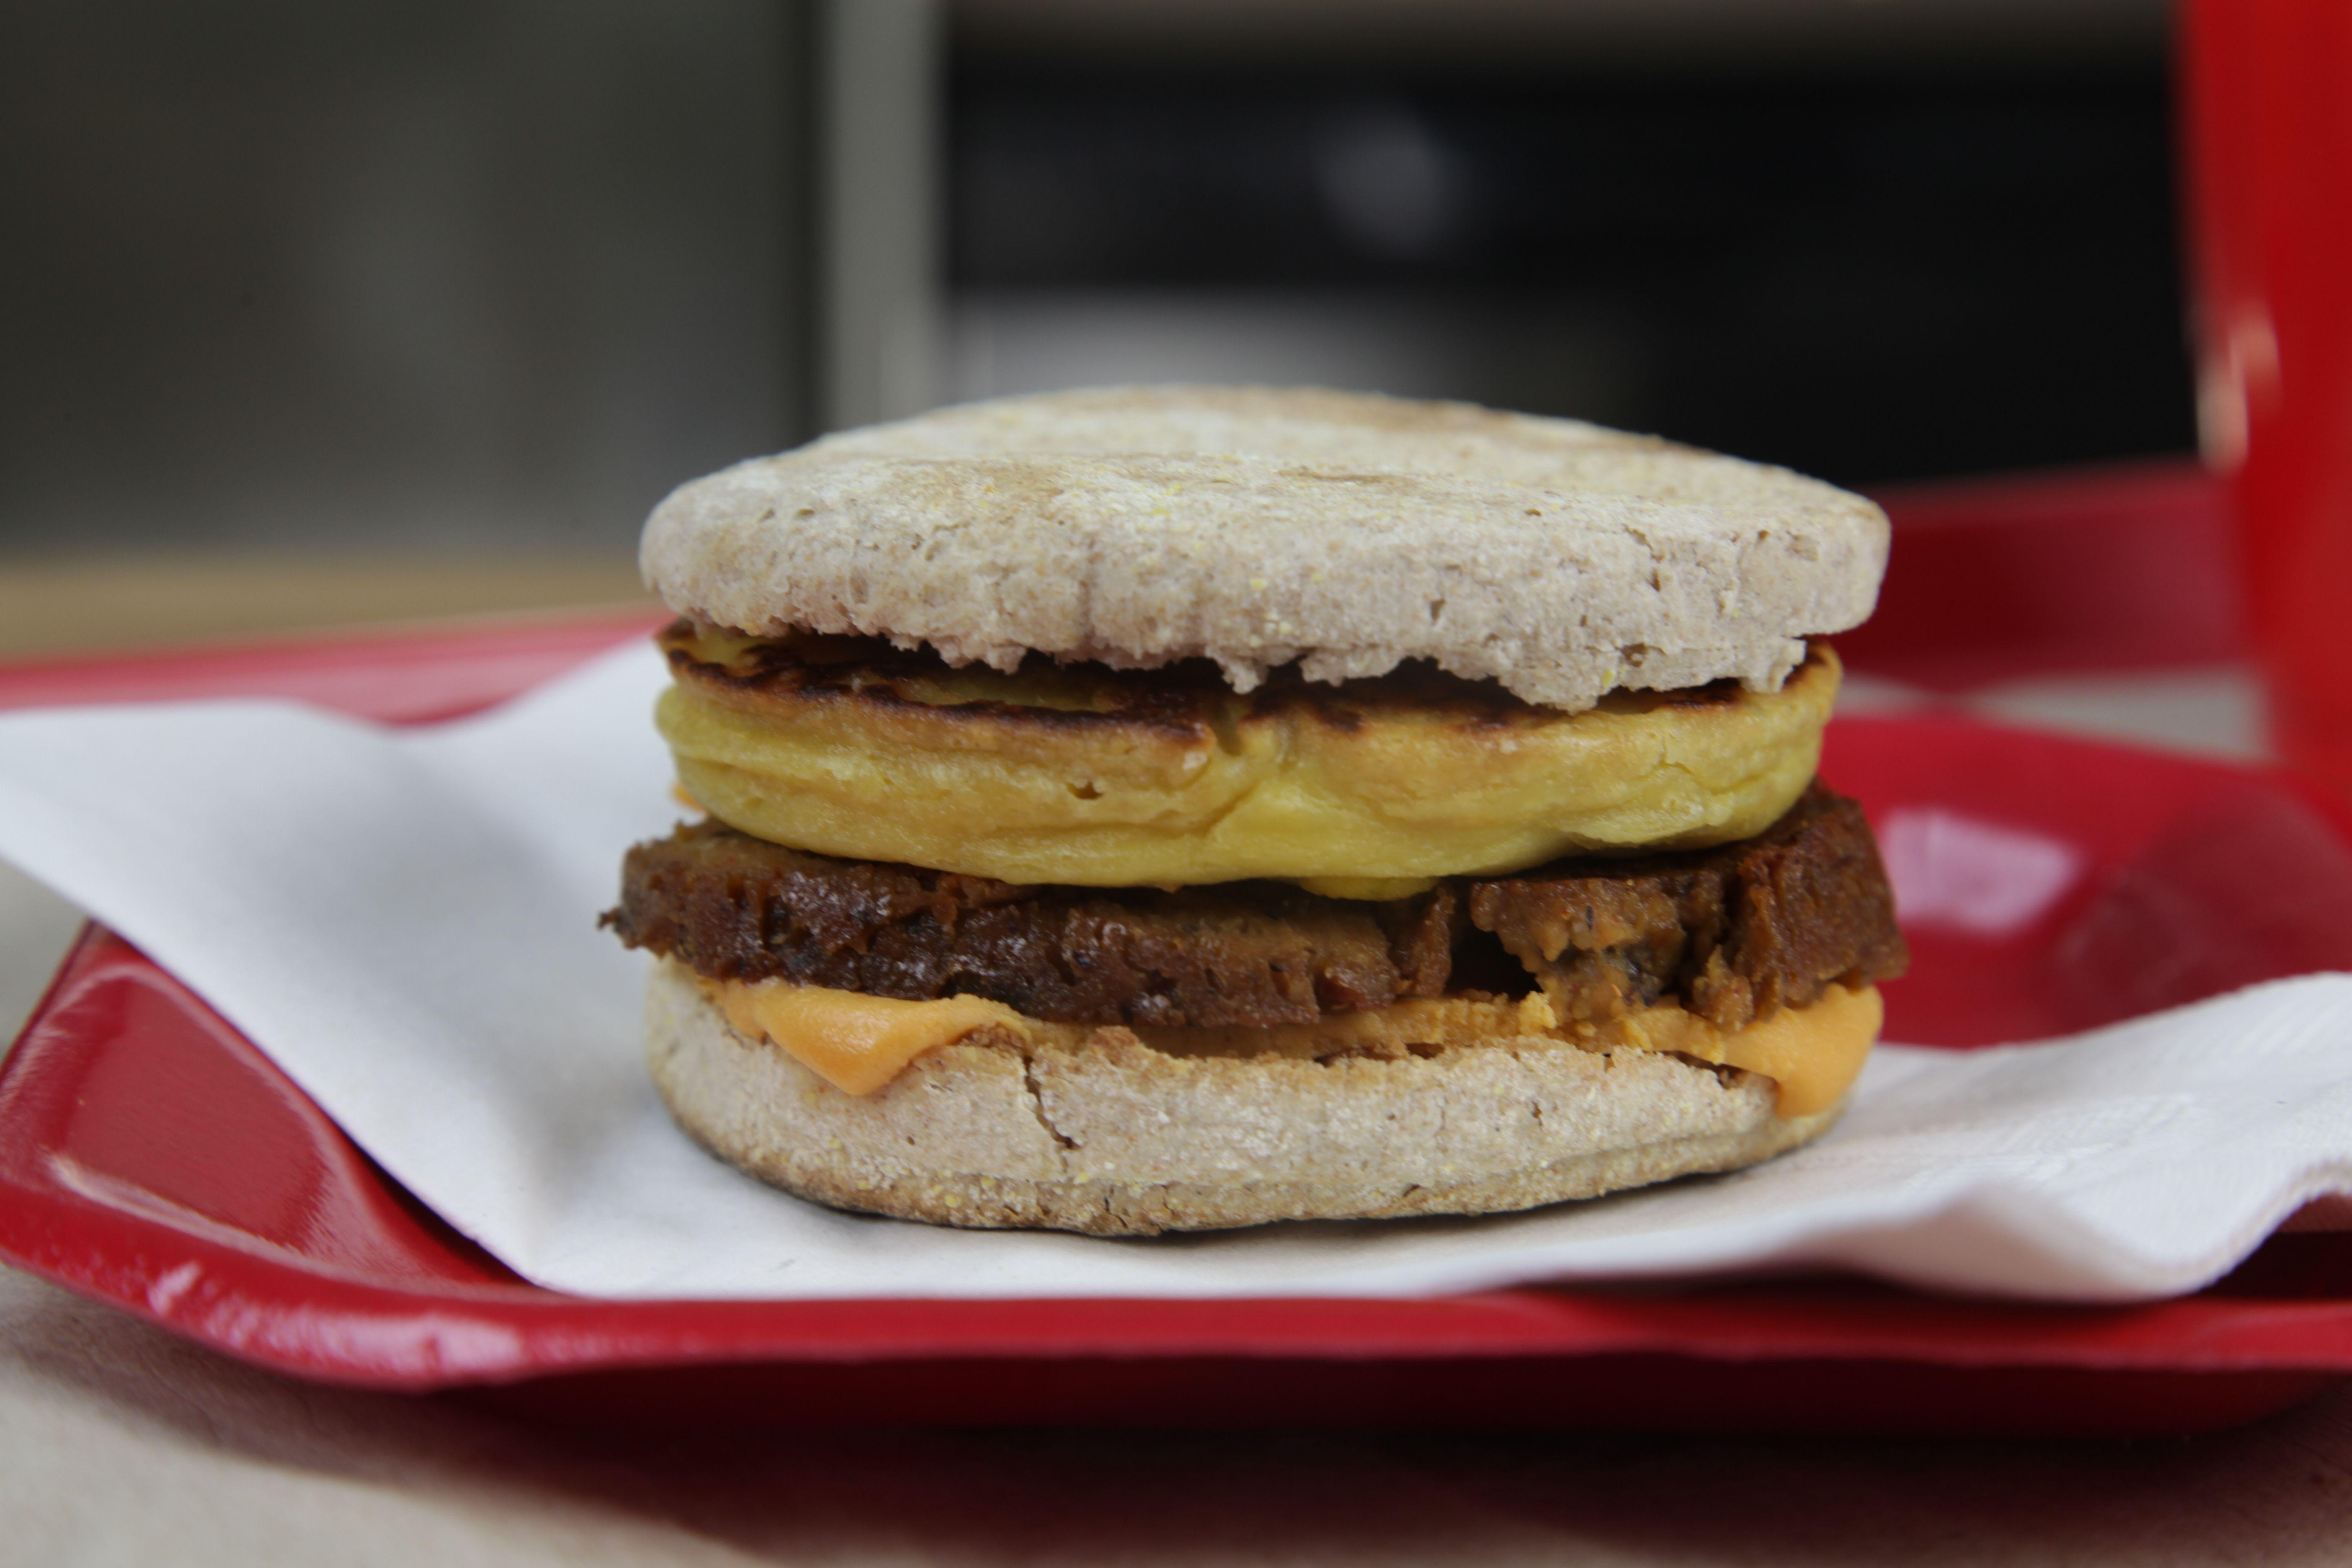 Vegan Mcdonald S Series Sausage Egg Mcmuffin The Edgy Veg Recipe Sausage And Egg Mcmuffin Edgy Veg Sausage And Egg